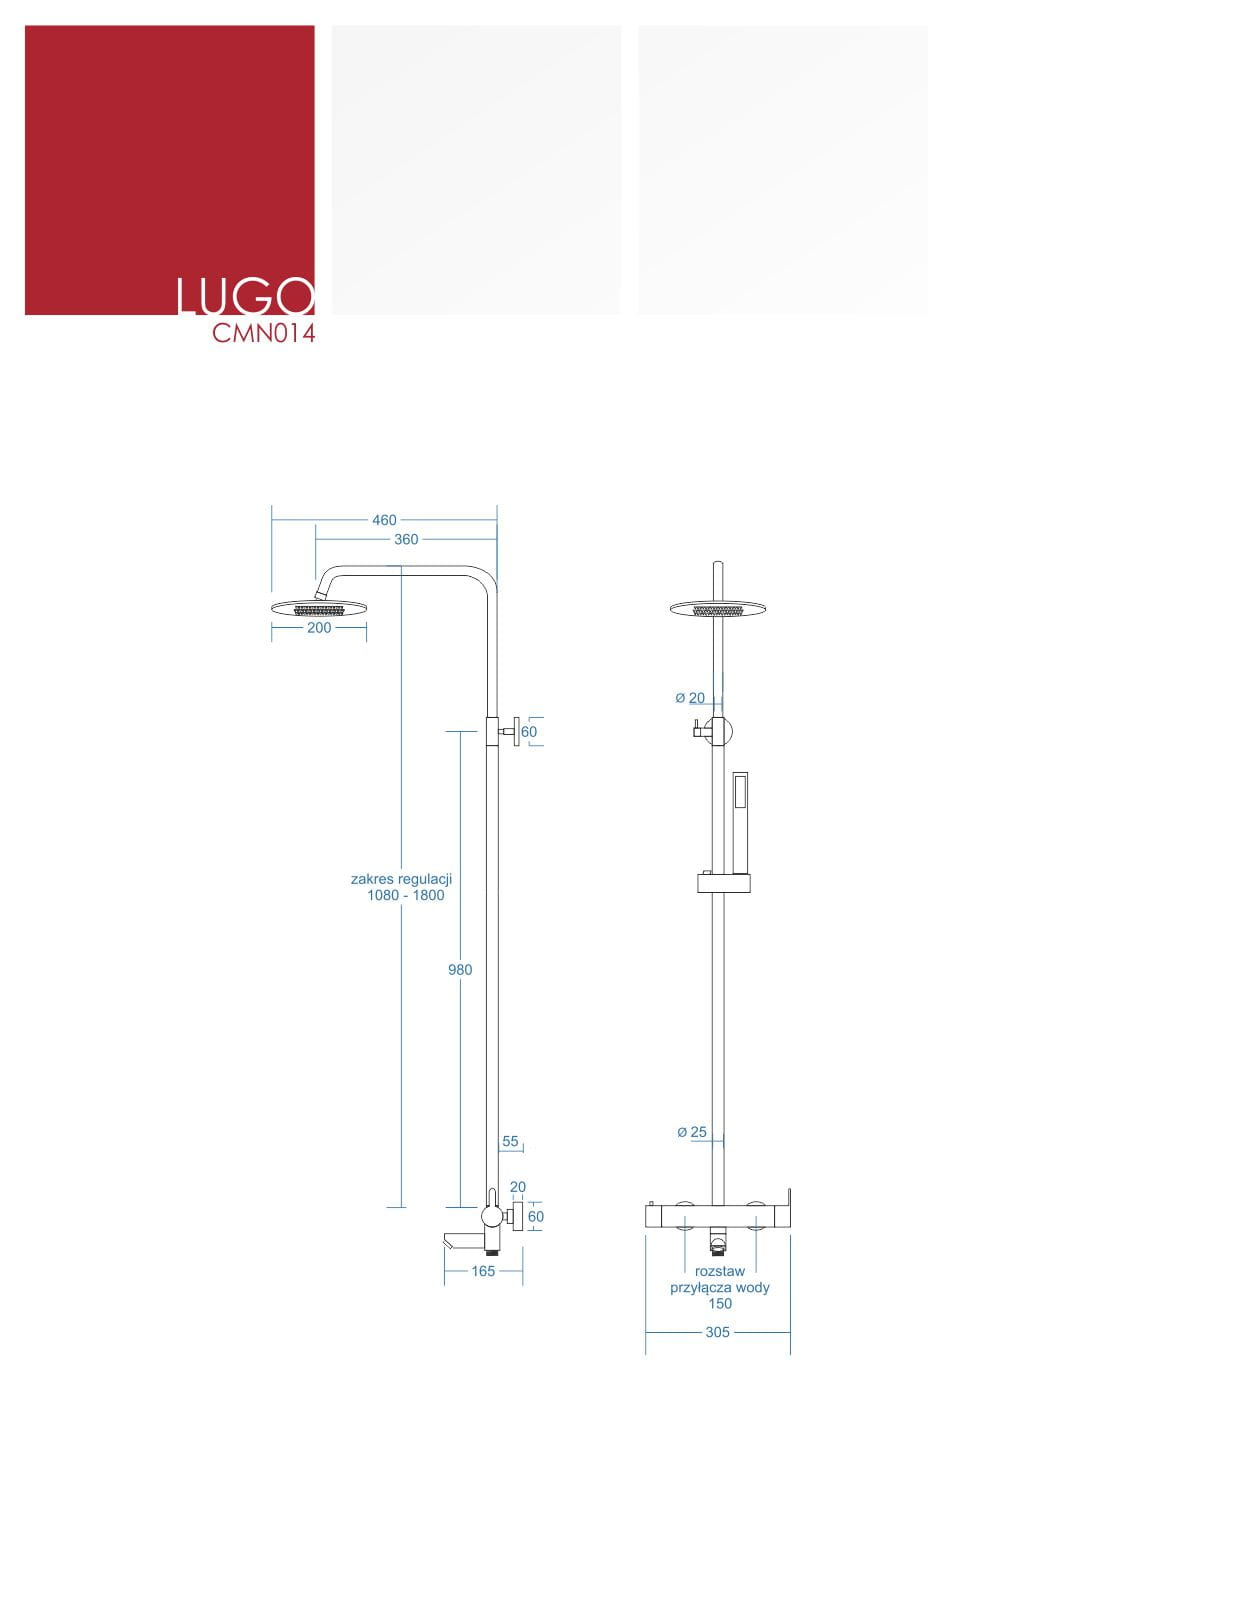 CMN014-LUGO-rys-tech.jpg